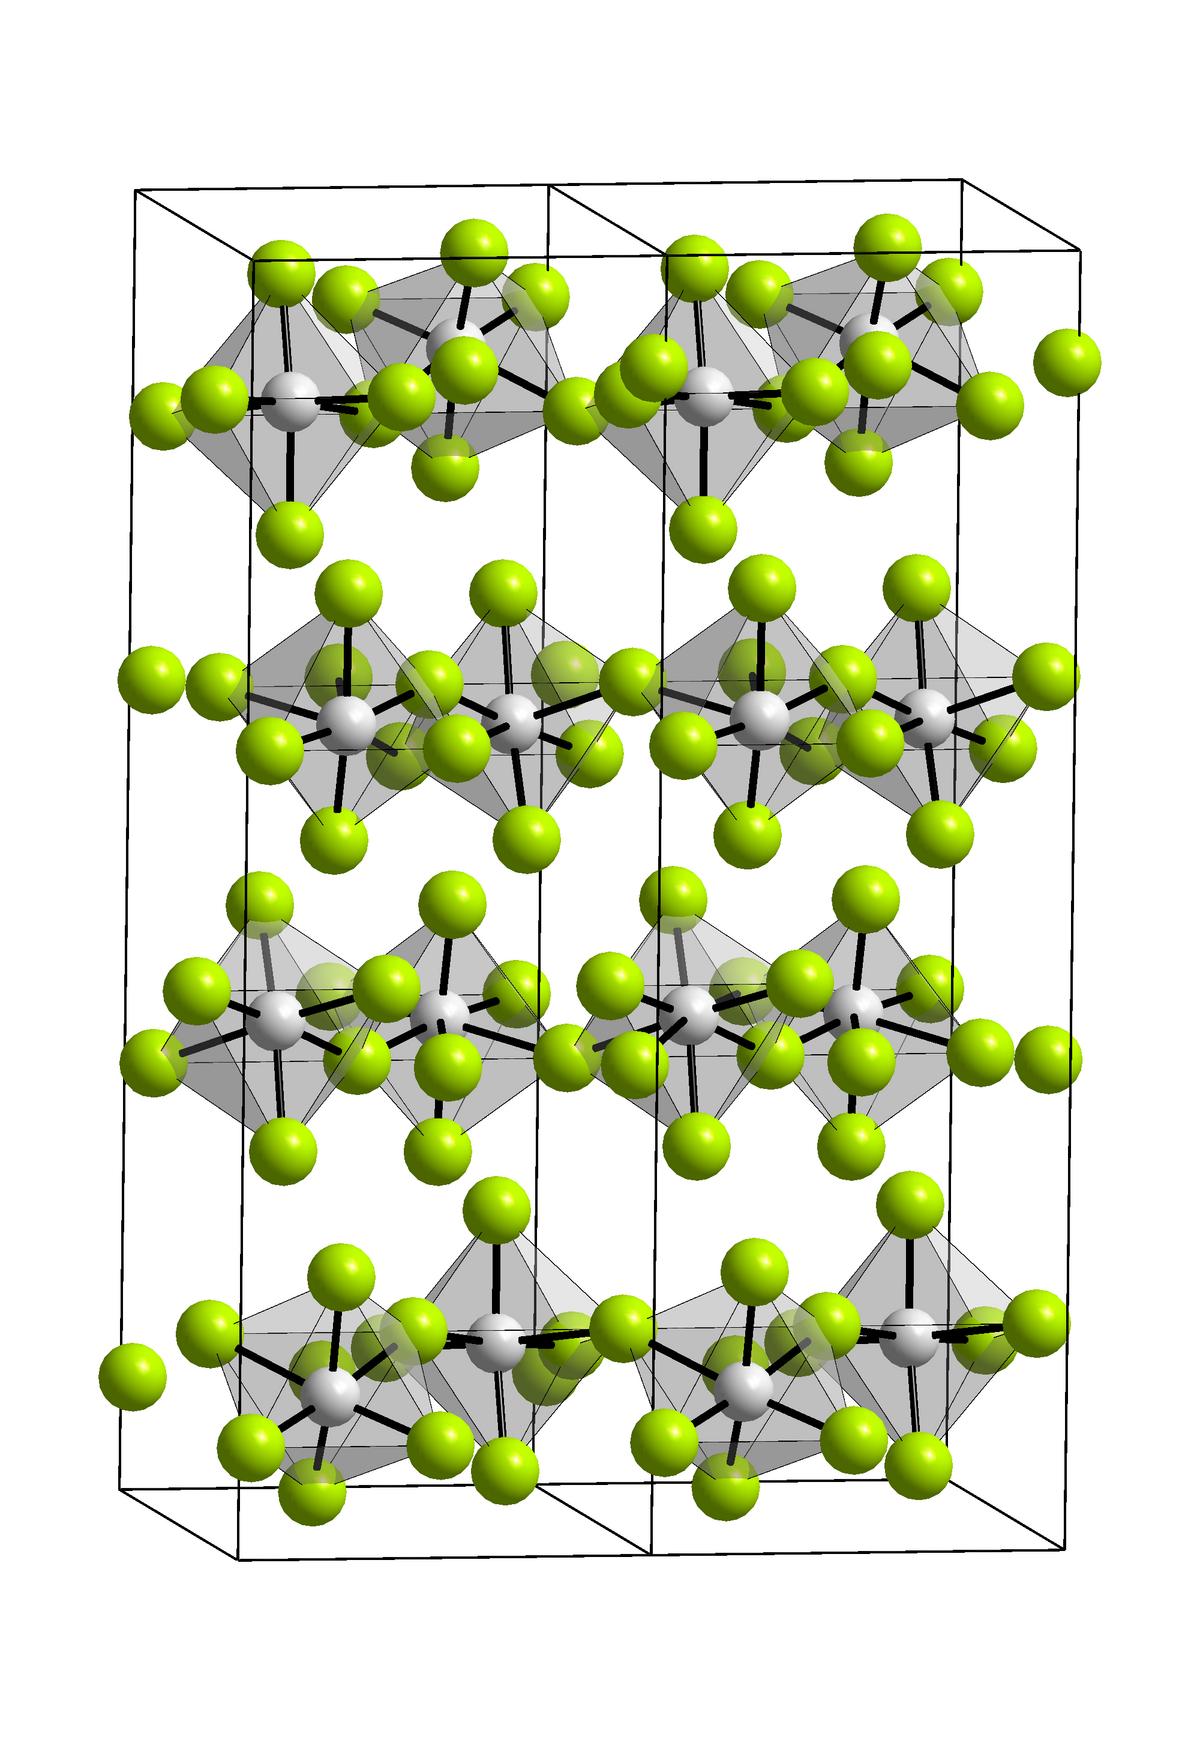 vanadium niobium tantalum Pris: 379 kr e-bok, 2013 laddas ned direkt köp chemistry of vanadium, niobium and tantalum av r j h clark, d brown, j c bailar, h j.